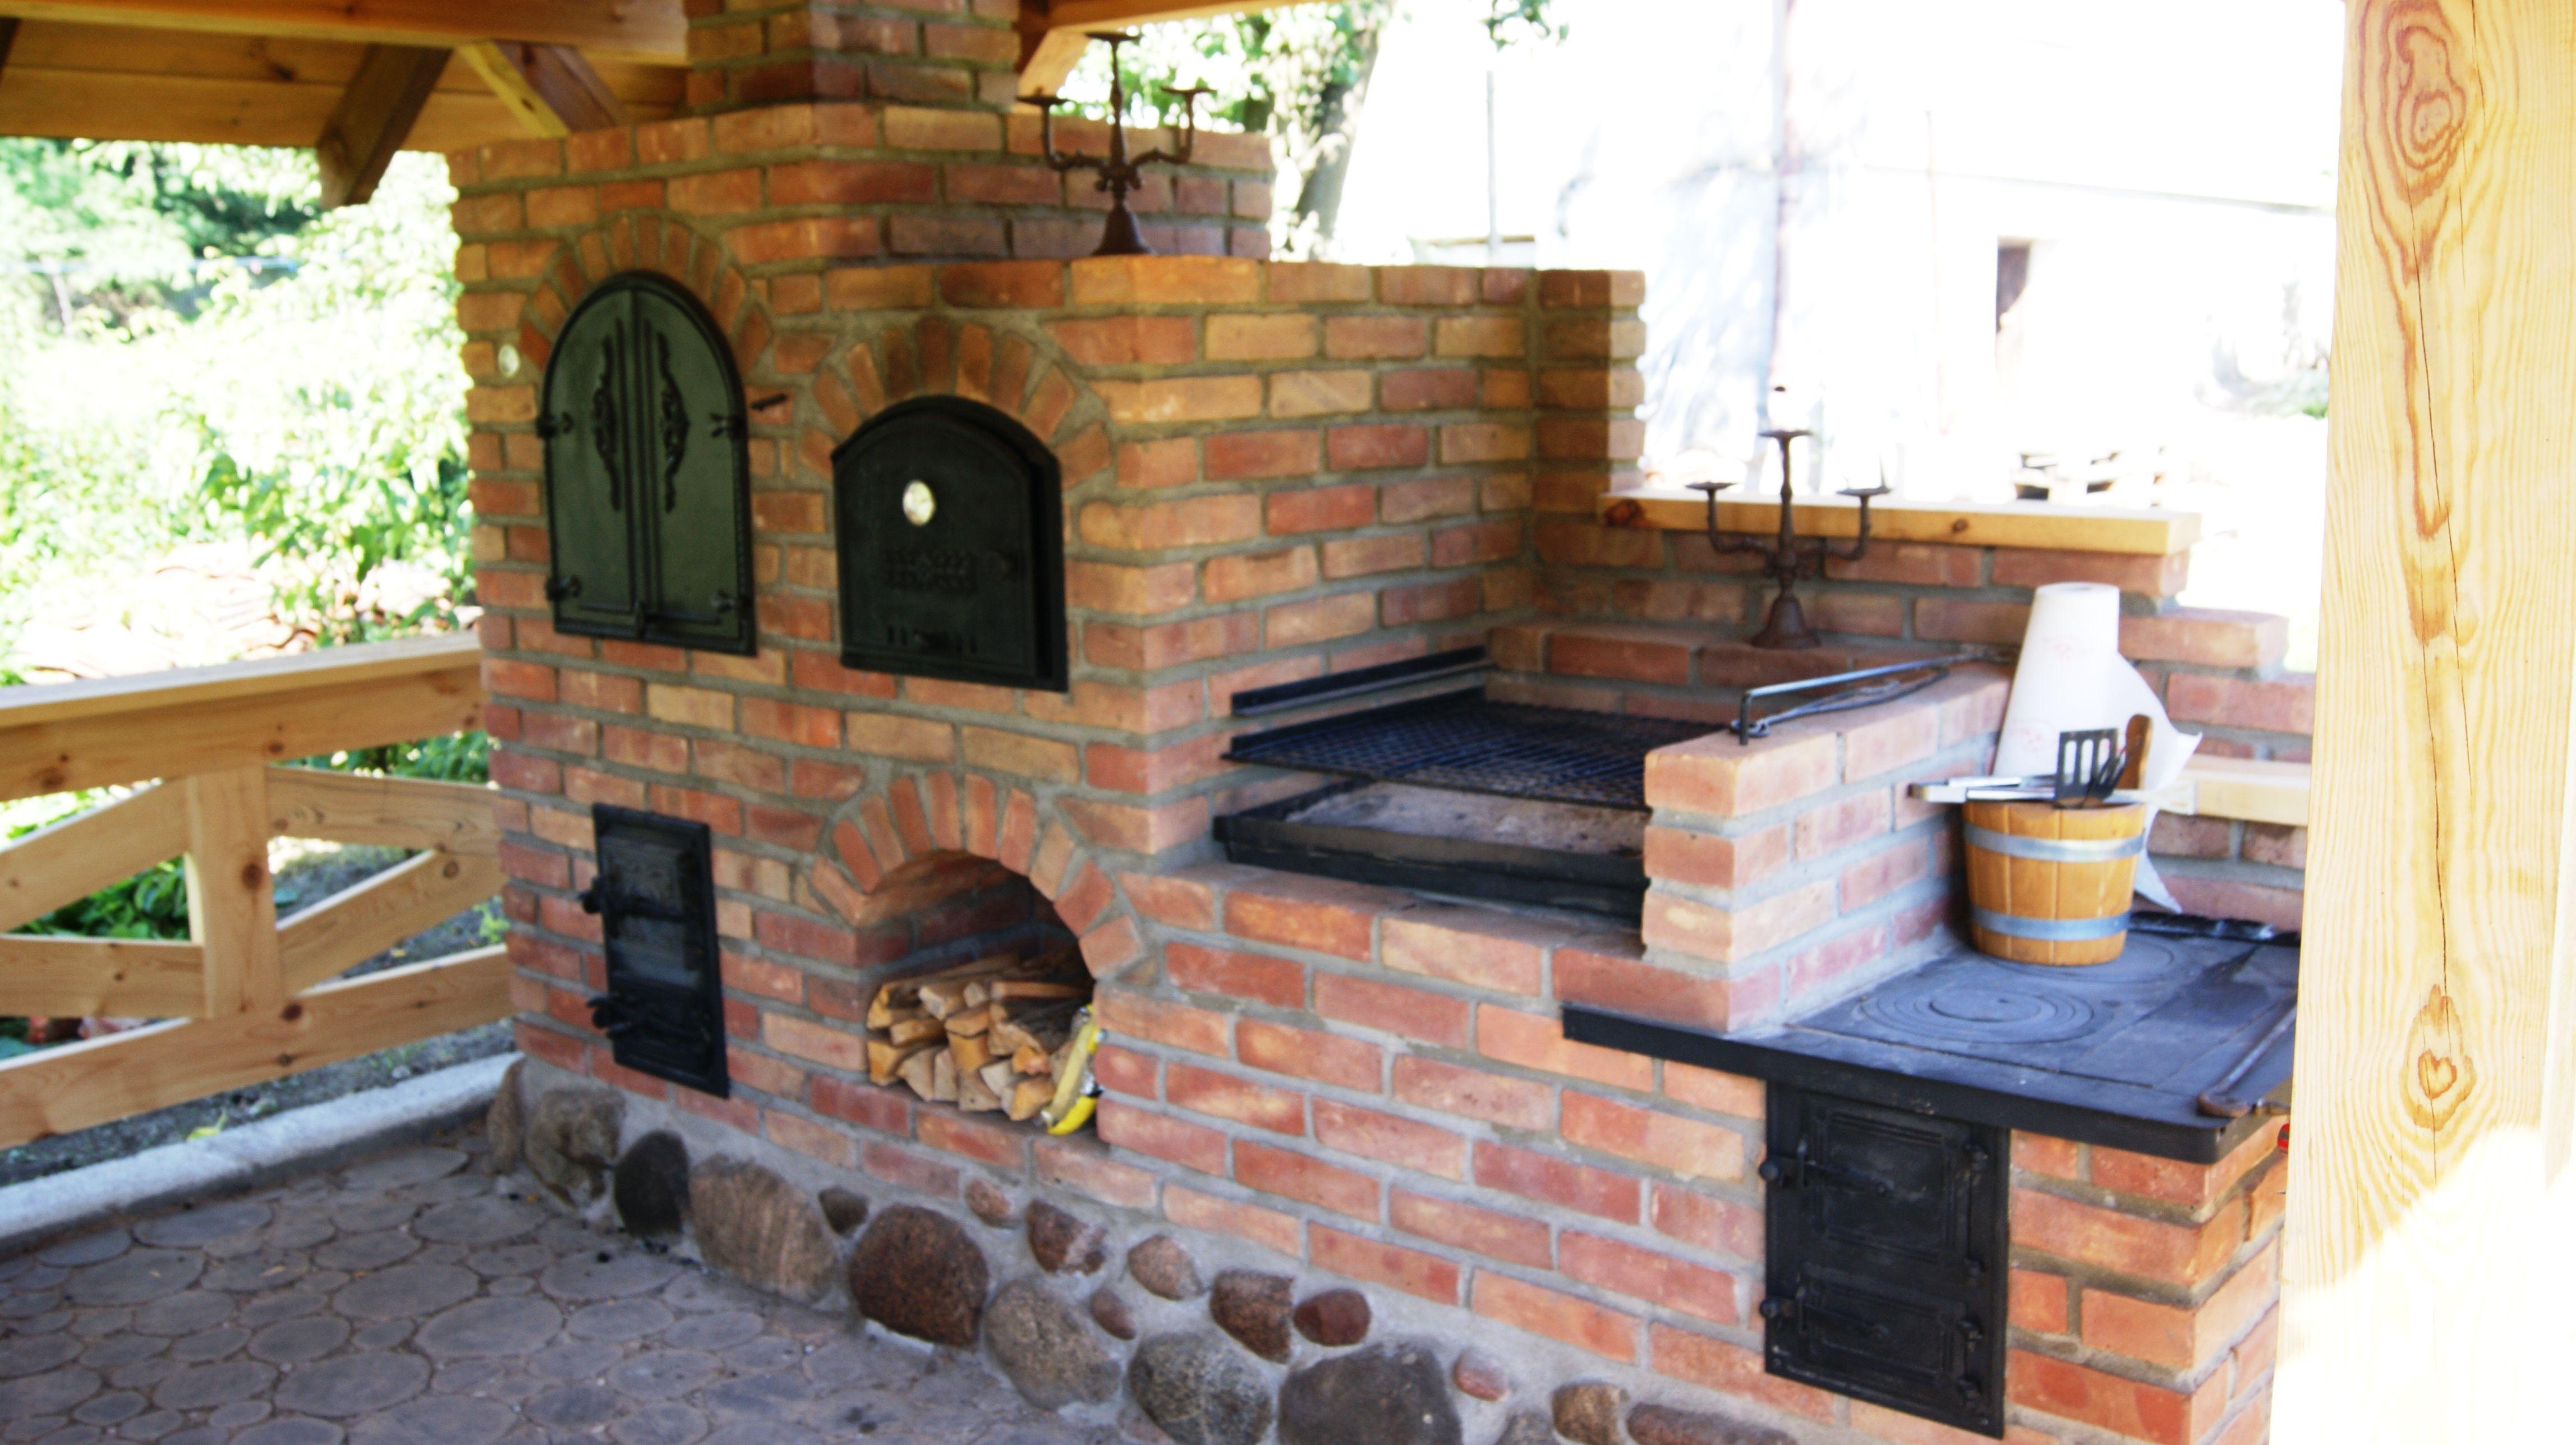 Grilo Wedzarnia Z Piecem Chlebowym I Kuchnia Letnia Outdoor Bbq Area Outdoor Fireplace Pizza Oven Outdoor Kitchen